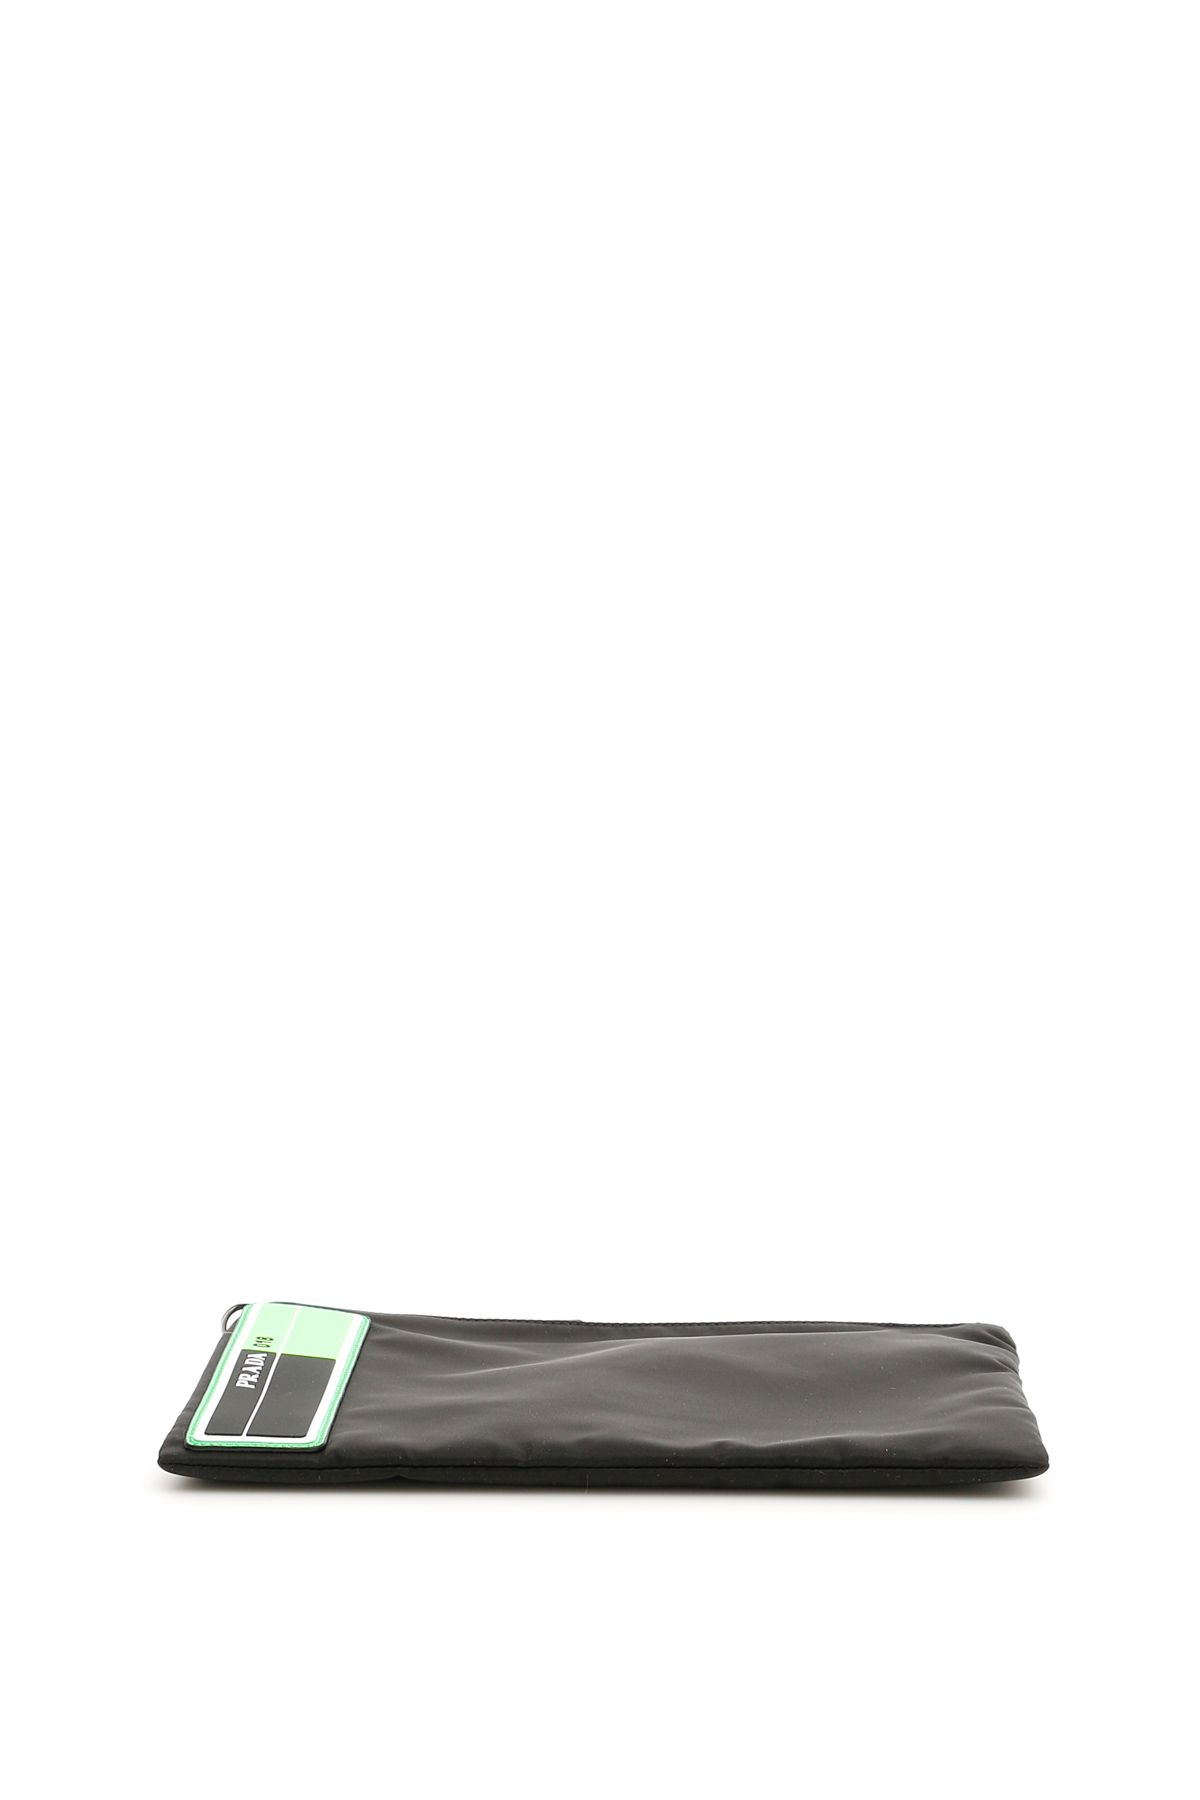 8430a266cd2f Prada Prada Flat Pouch With Wristlet - NERO VERDE FLUO (Black ...